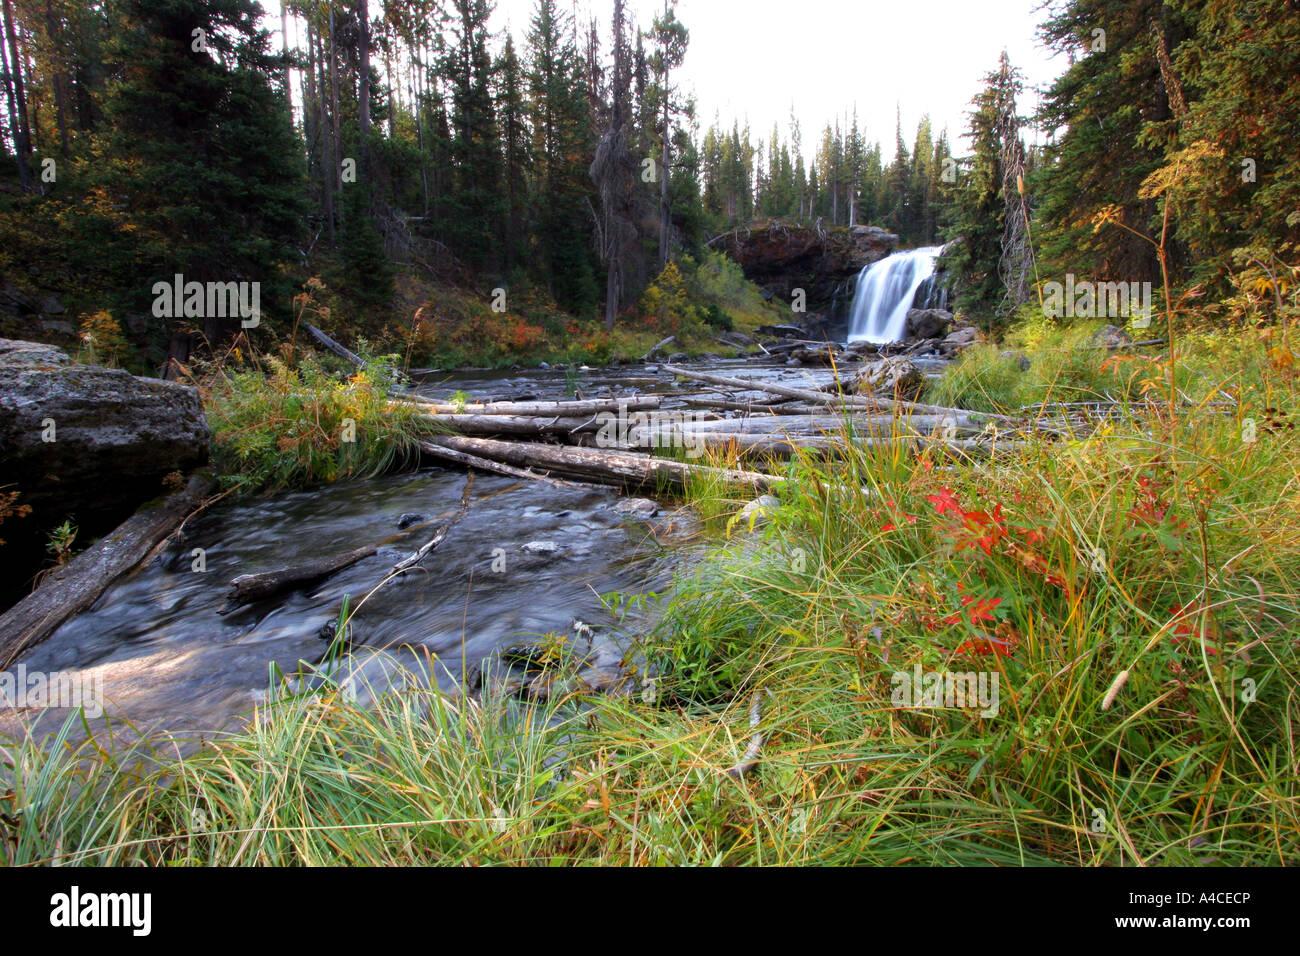 Moose falls, parc national de Yellowstone Banque D'Images